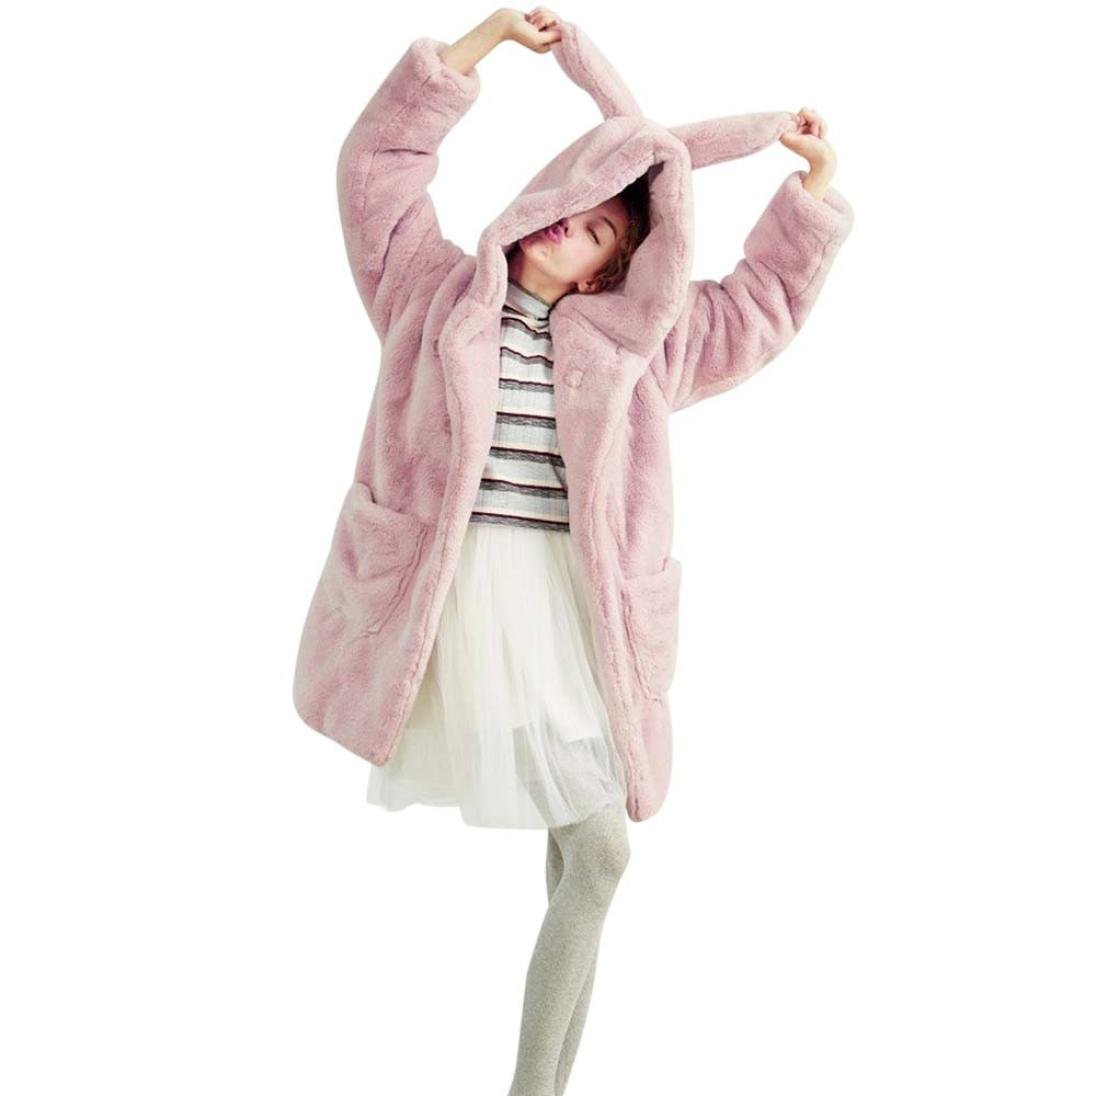 HP95(TM) Women Winter Hooded Faux Fur Long Coat Cute Plush Rabbit Ears Coat (L, Pink)